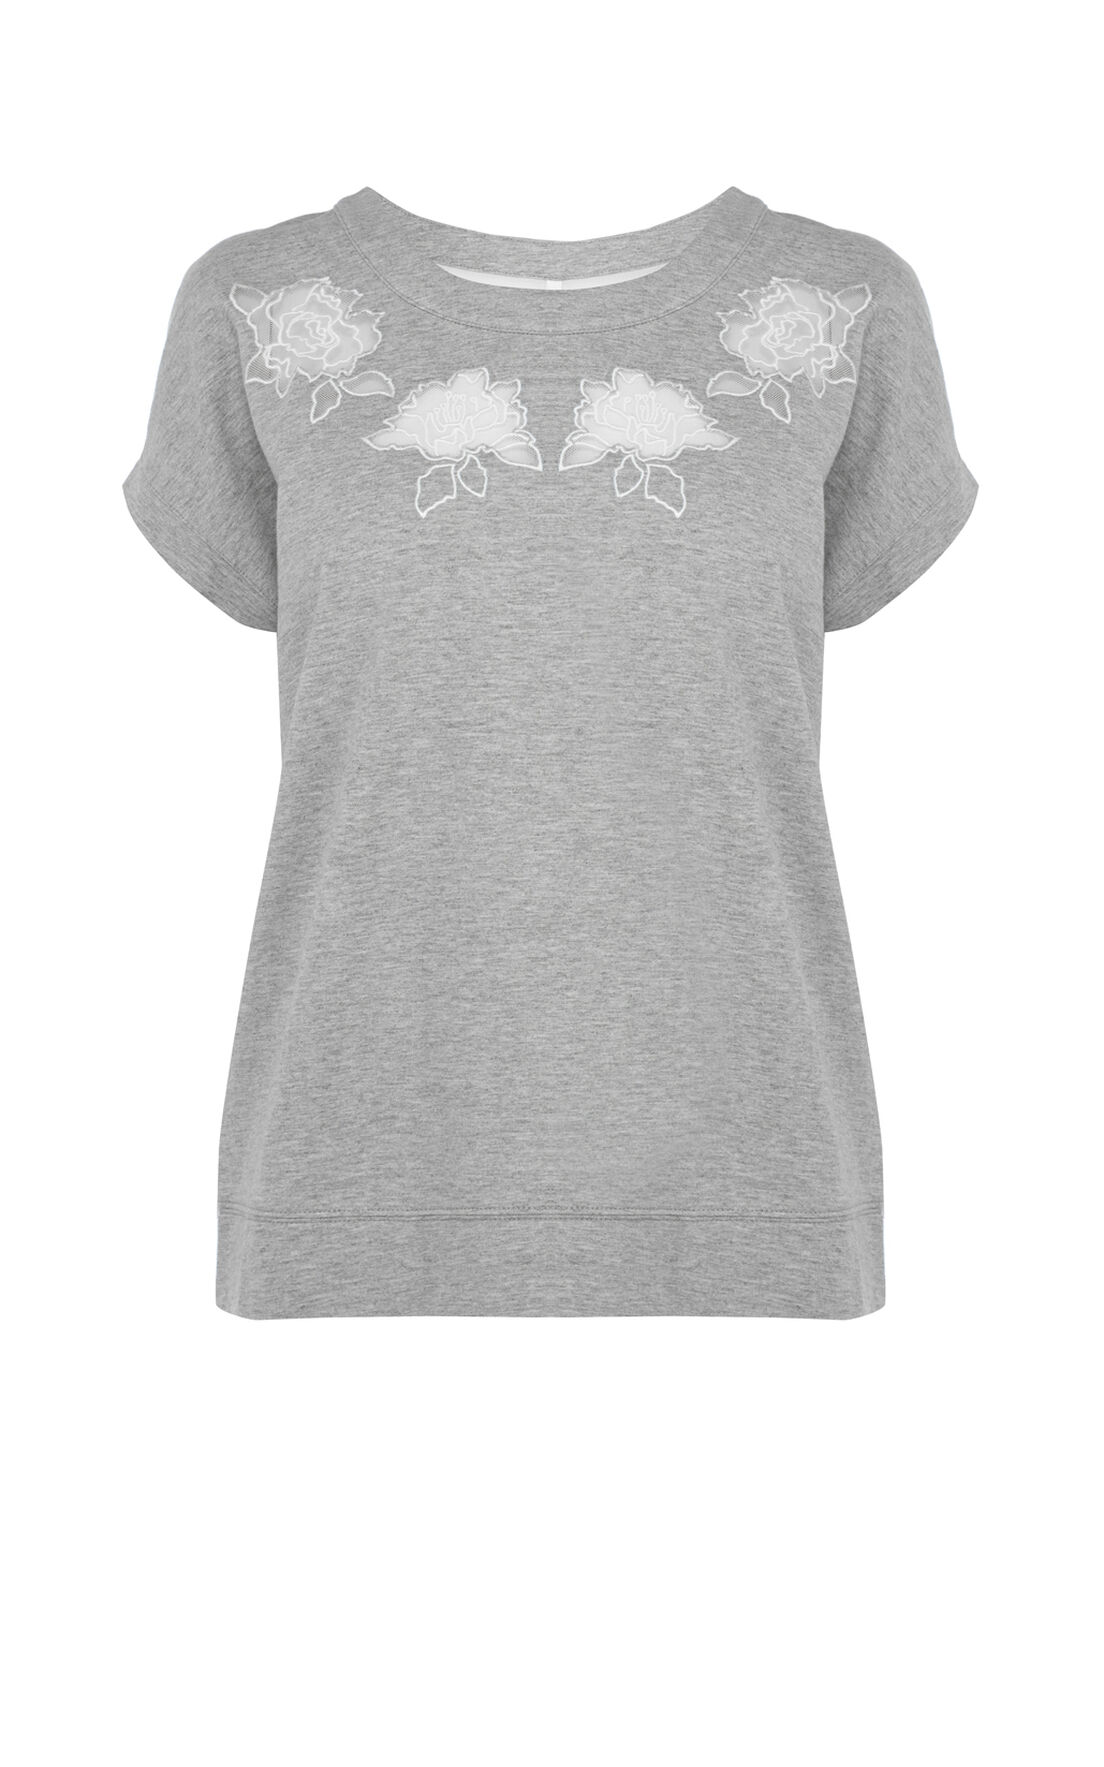 Karen Millen, Embroidered Sweatshirt Grey/Multi 0